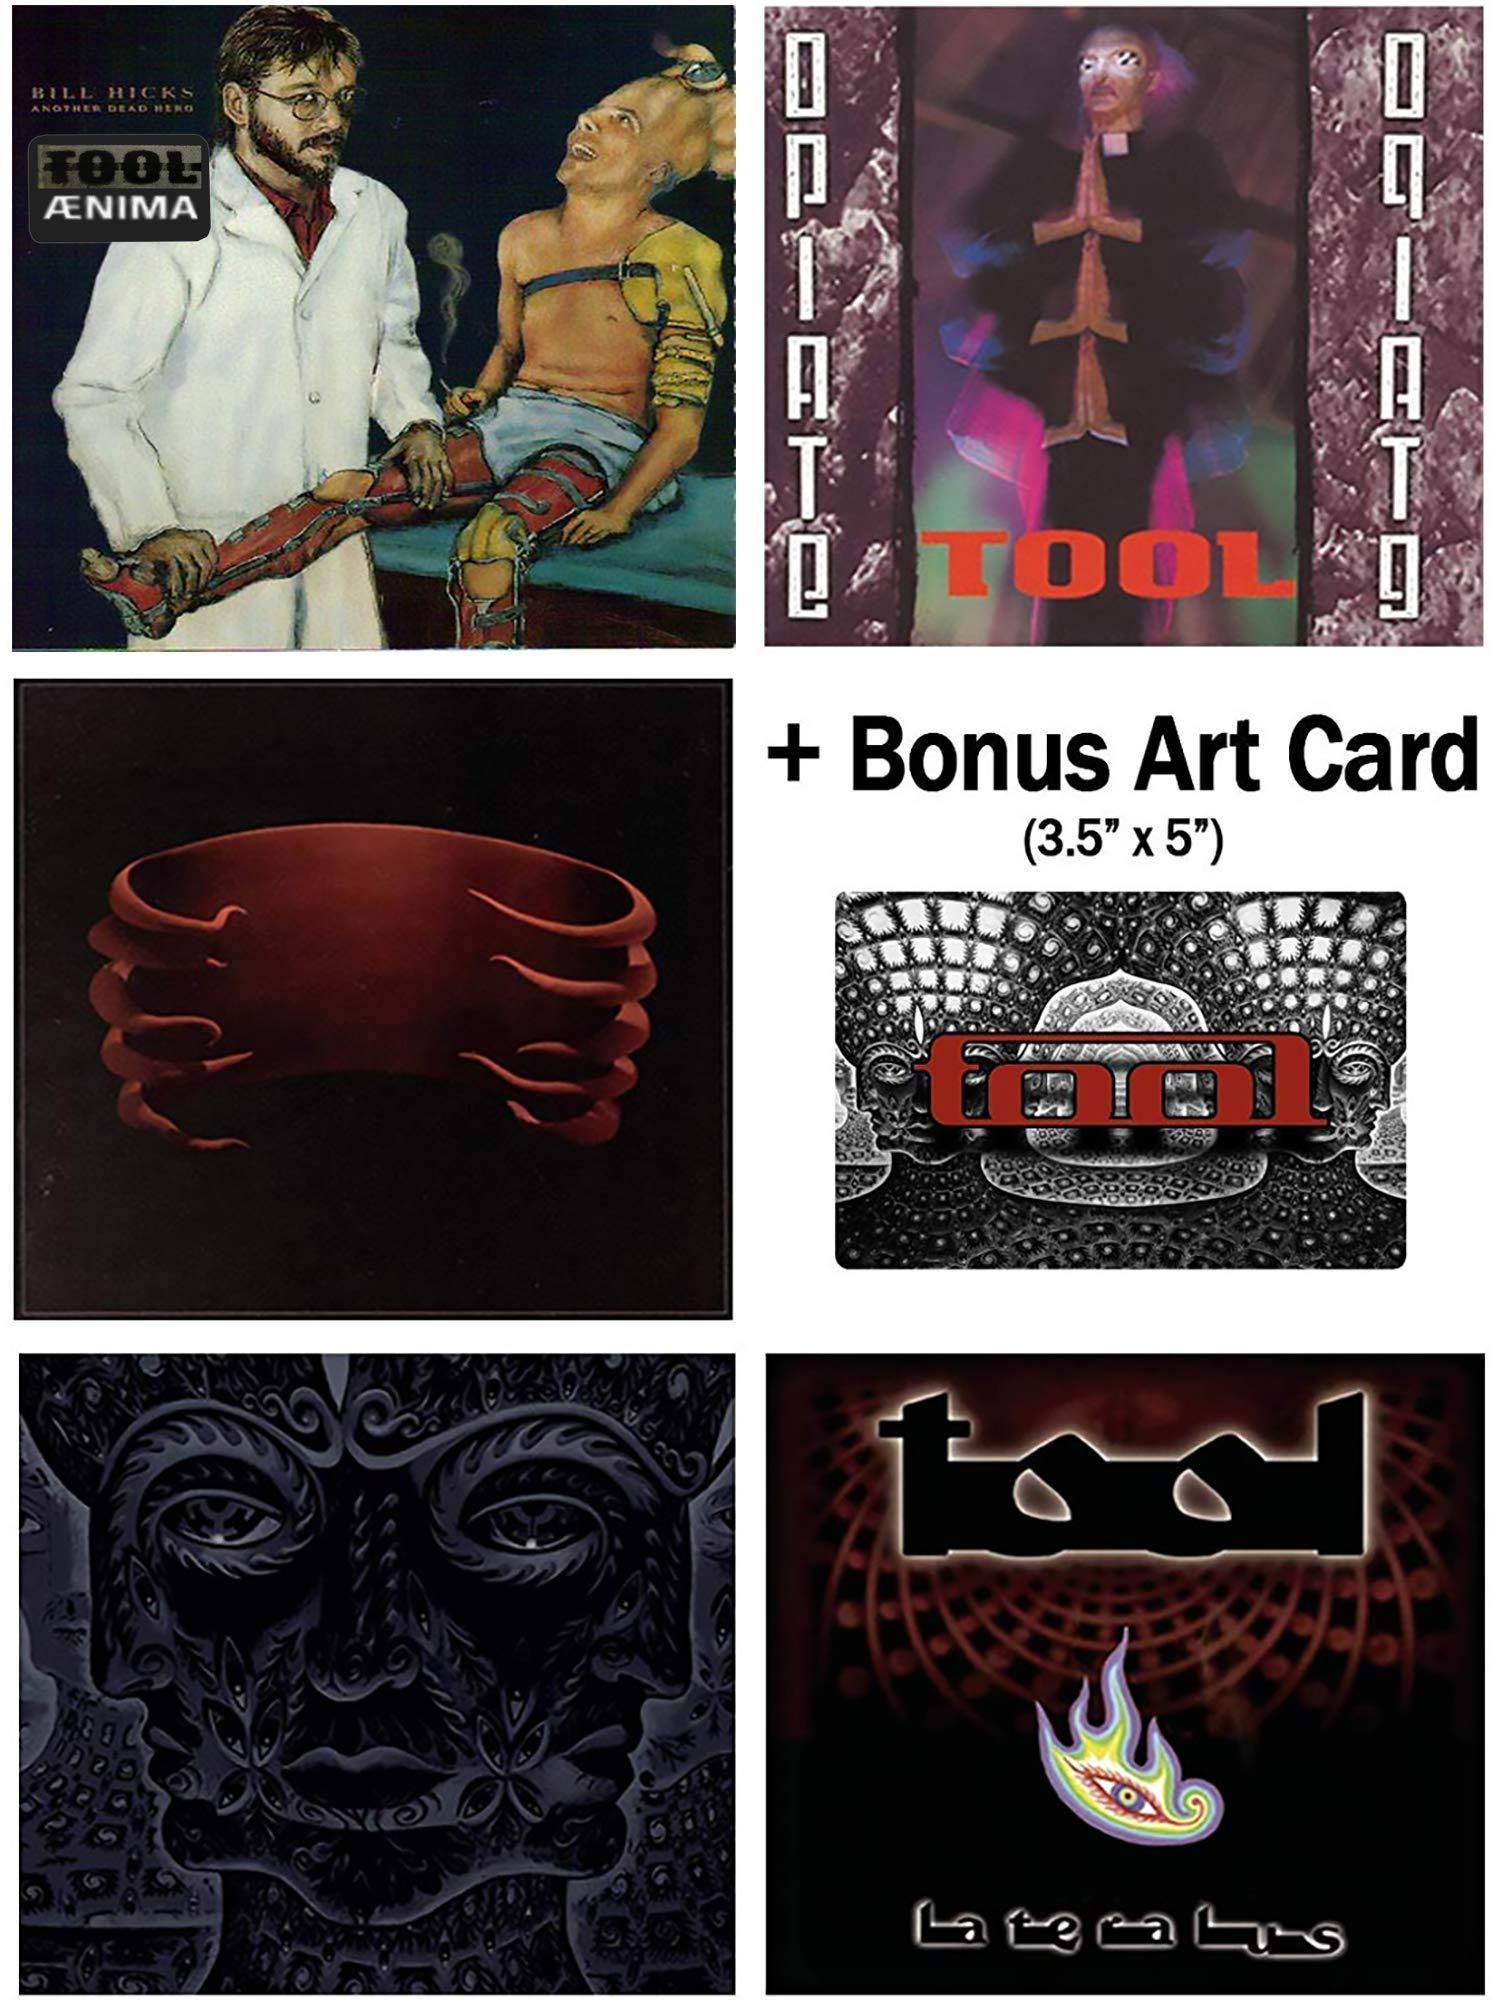 Tool: Complete Studio Album CD Collection with Bonus Art Card by Volcano